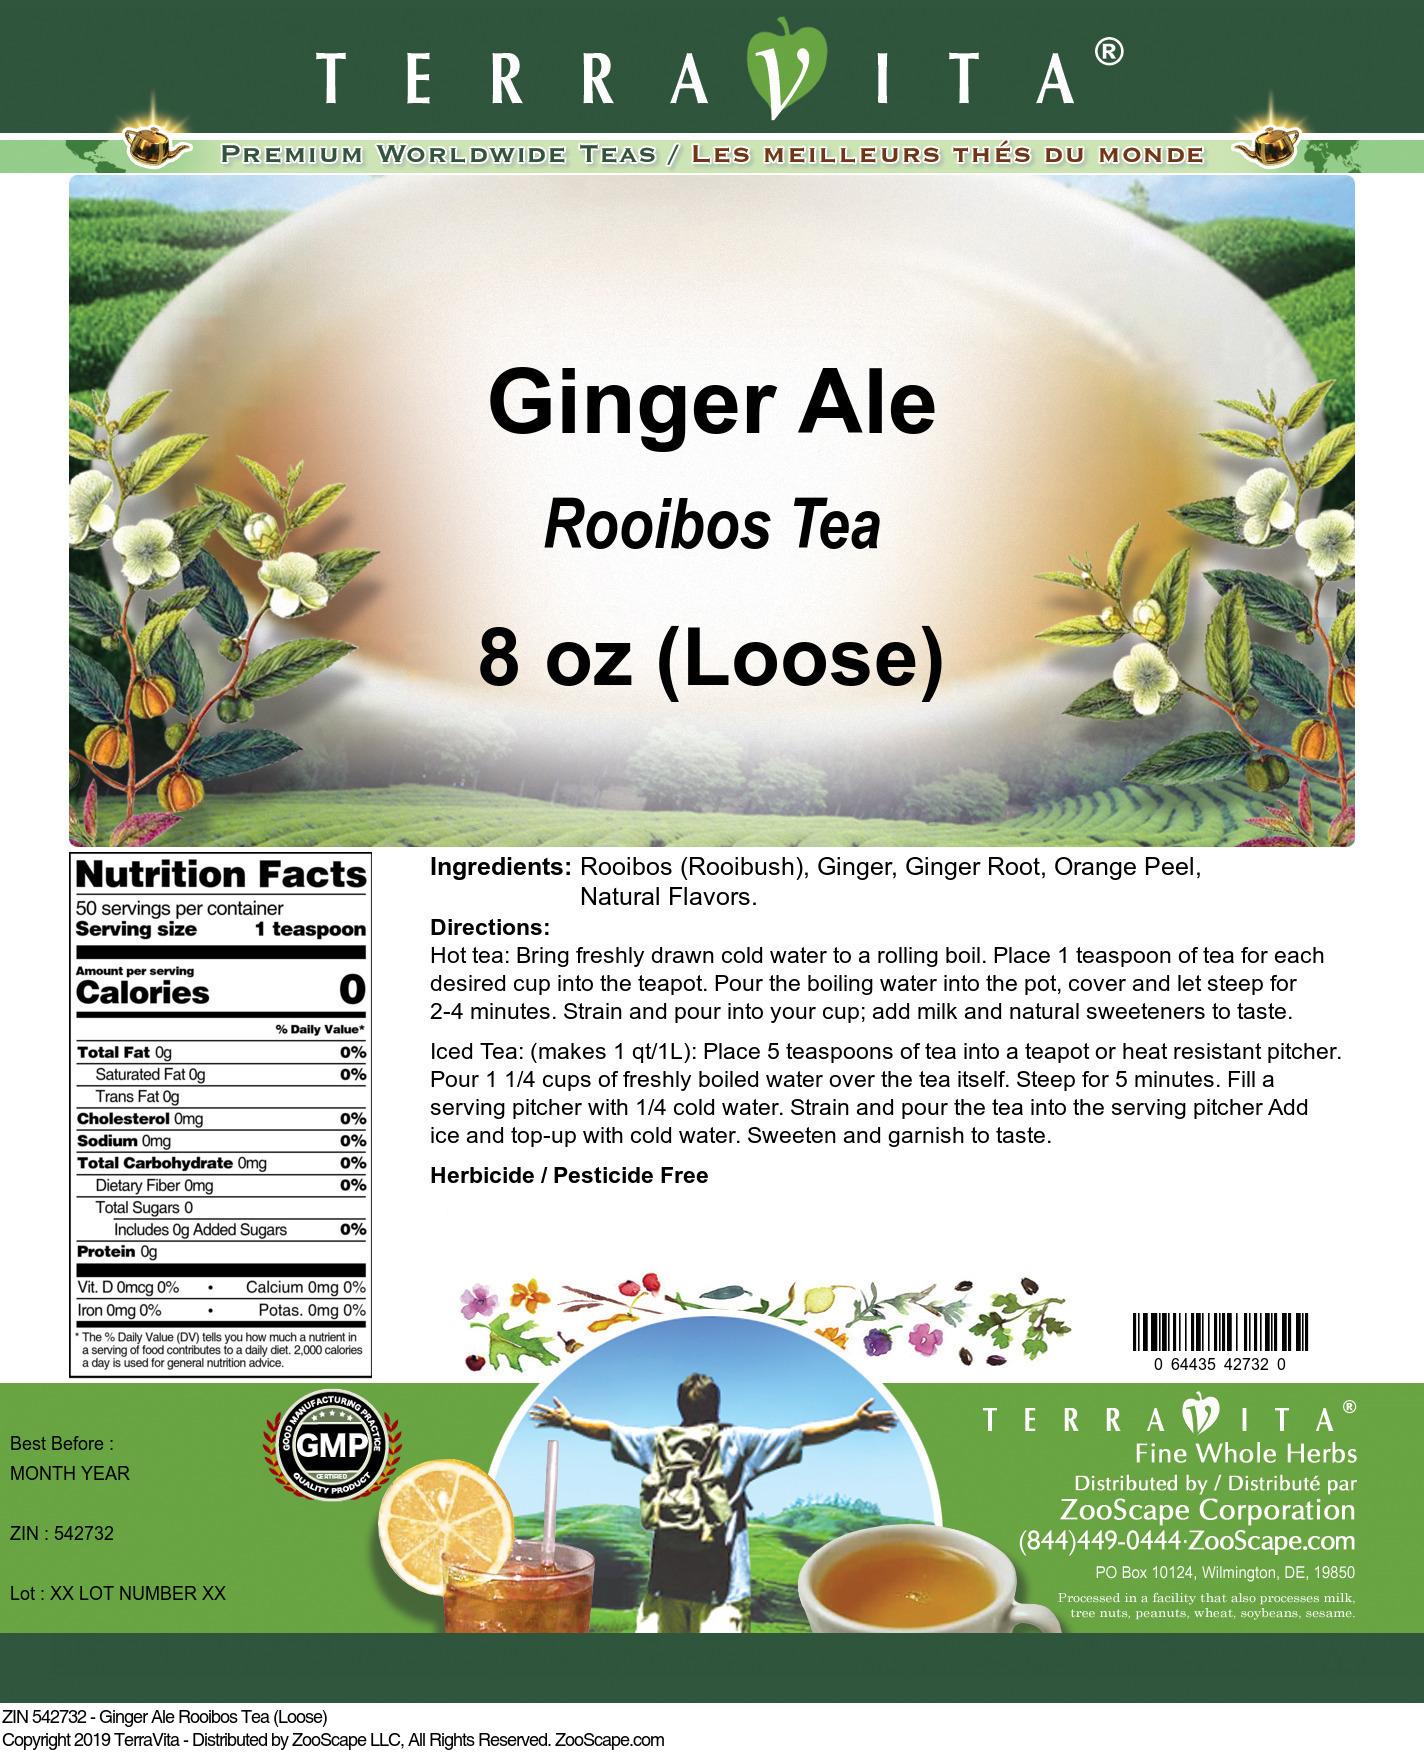 Ginger Ale Rooibos Tea